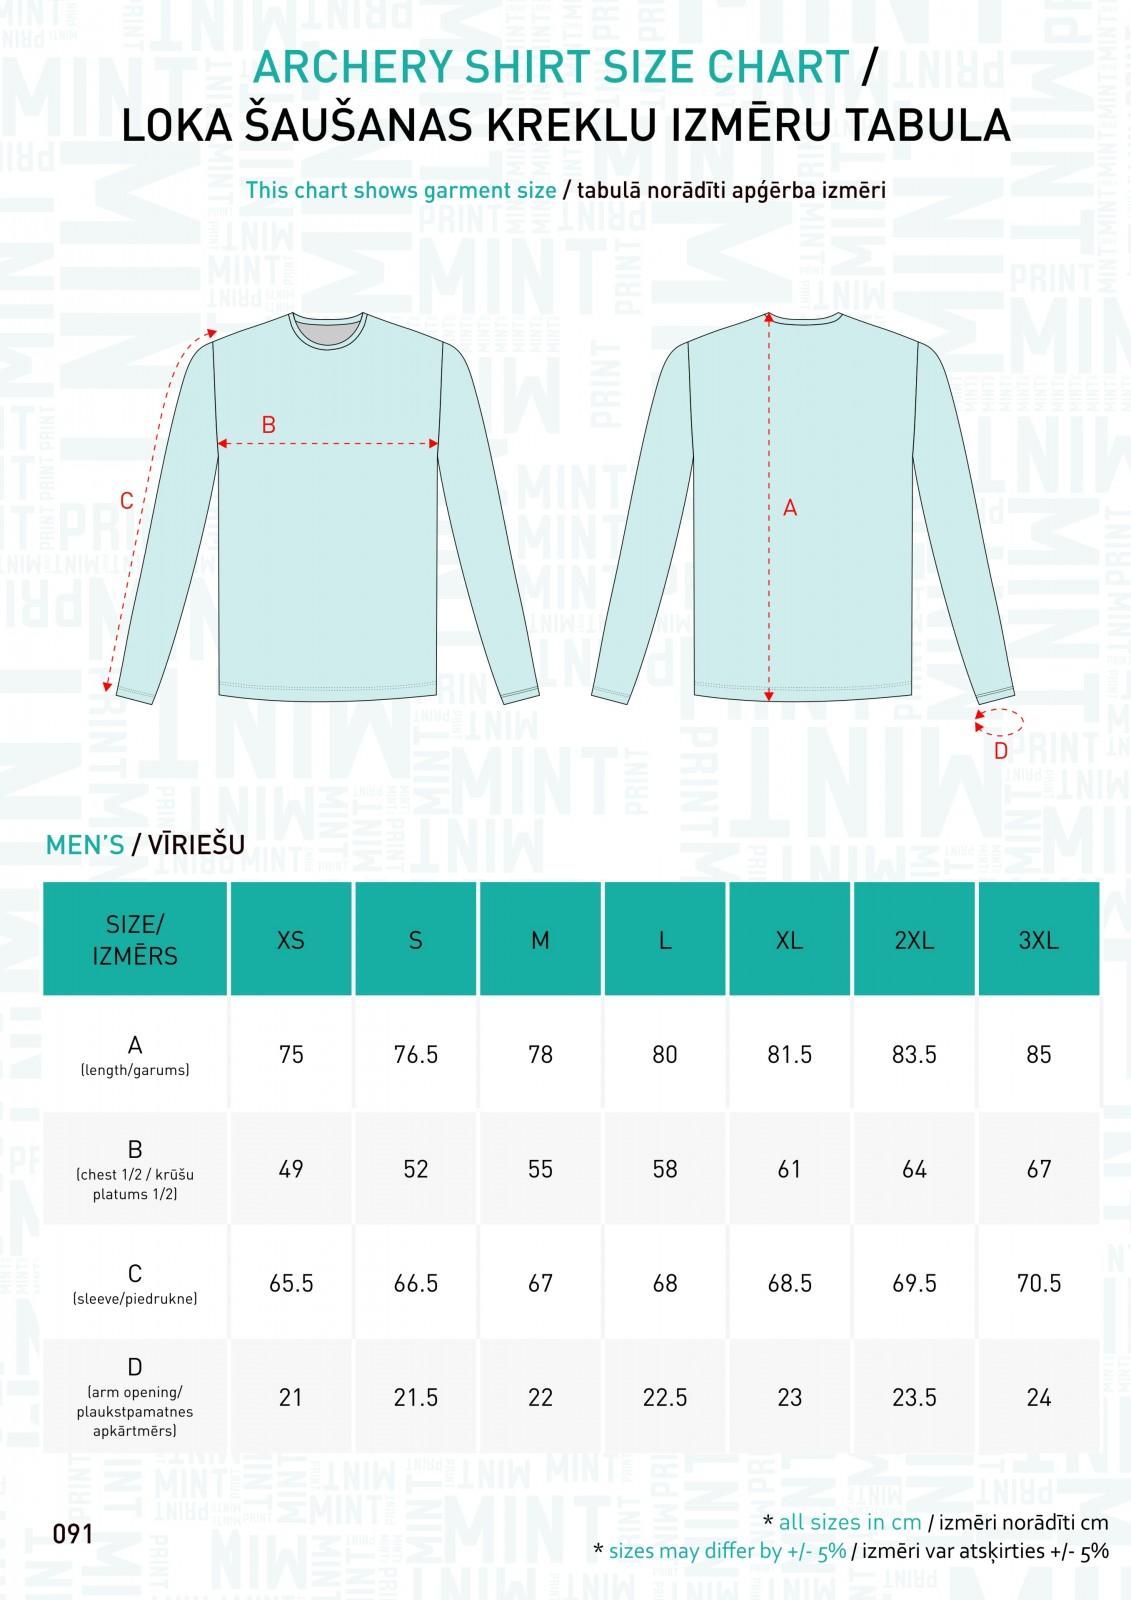 091 - Archery kreklu izm tabulas - MEN